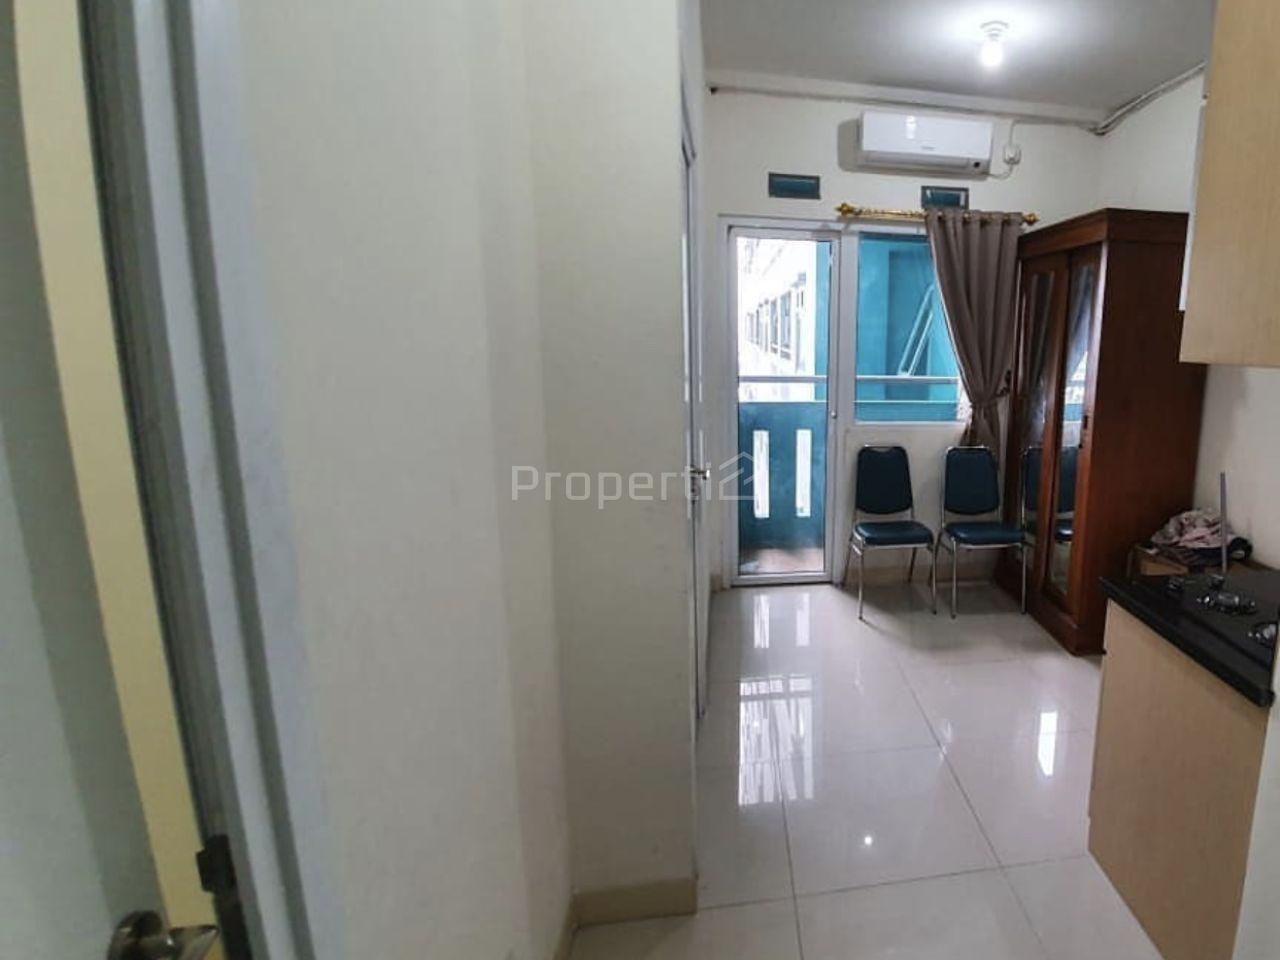 2 in 1-2BR Apartment Unit at Green Pramuka City, DKI Jakarta